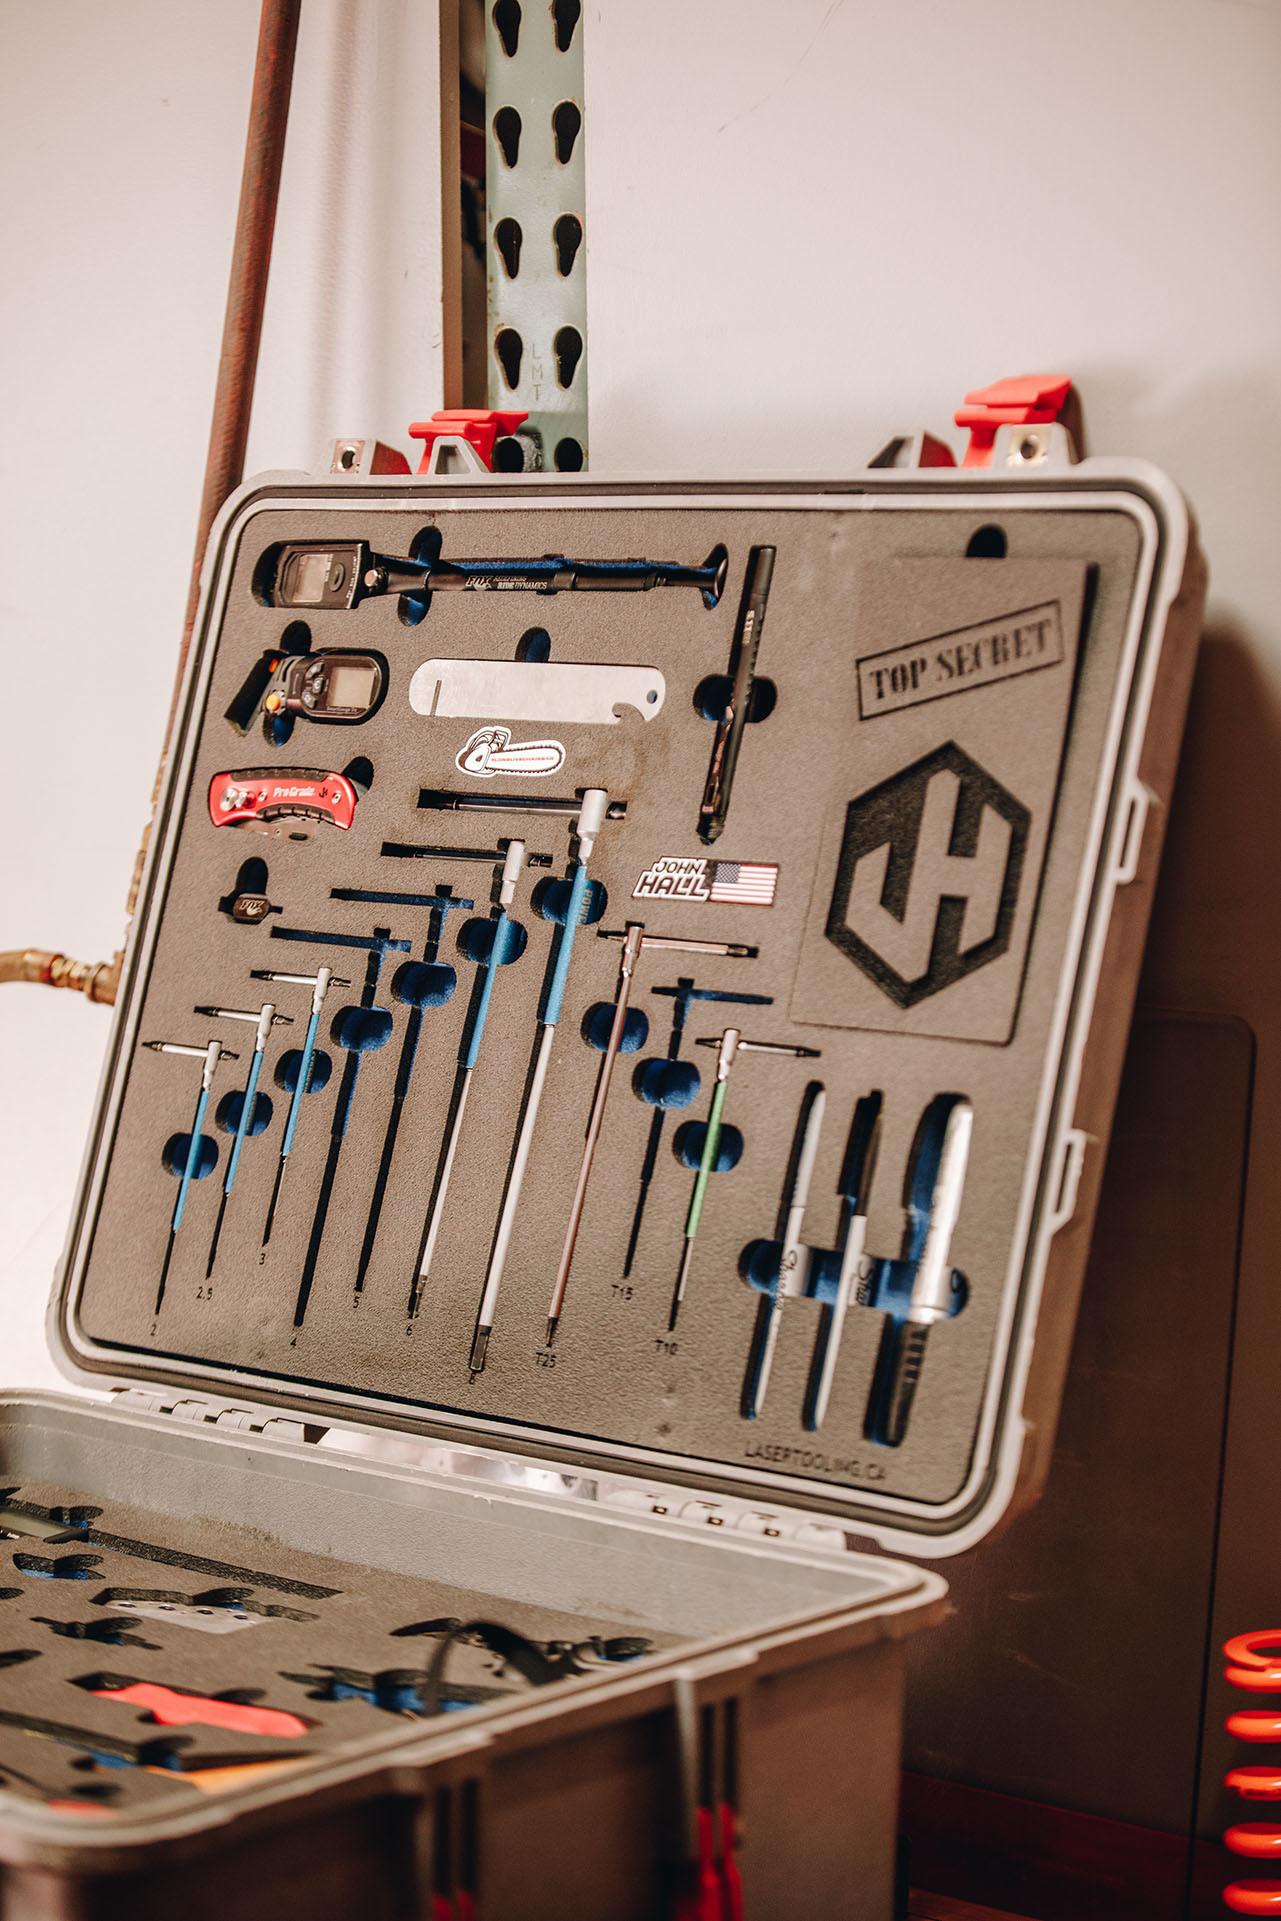 Sneak peak inside John's tool box